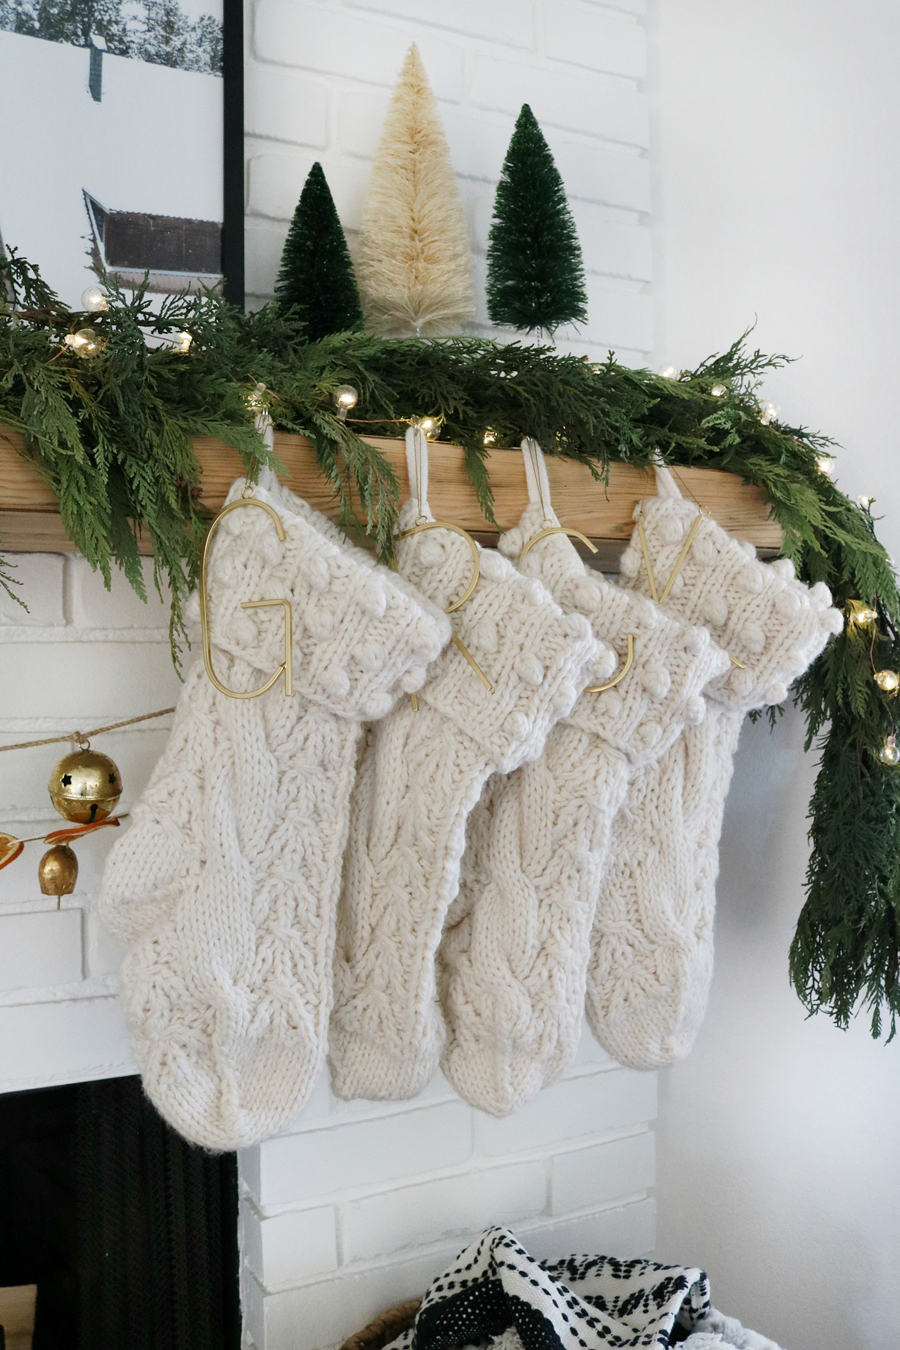 Modern & Cozy Holiday Decor Ideas